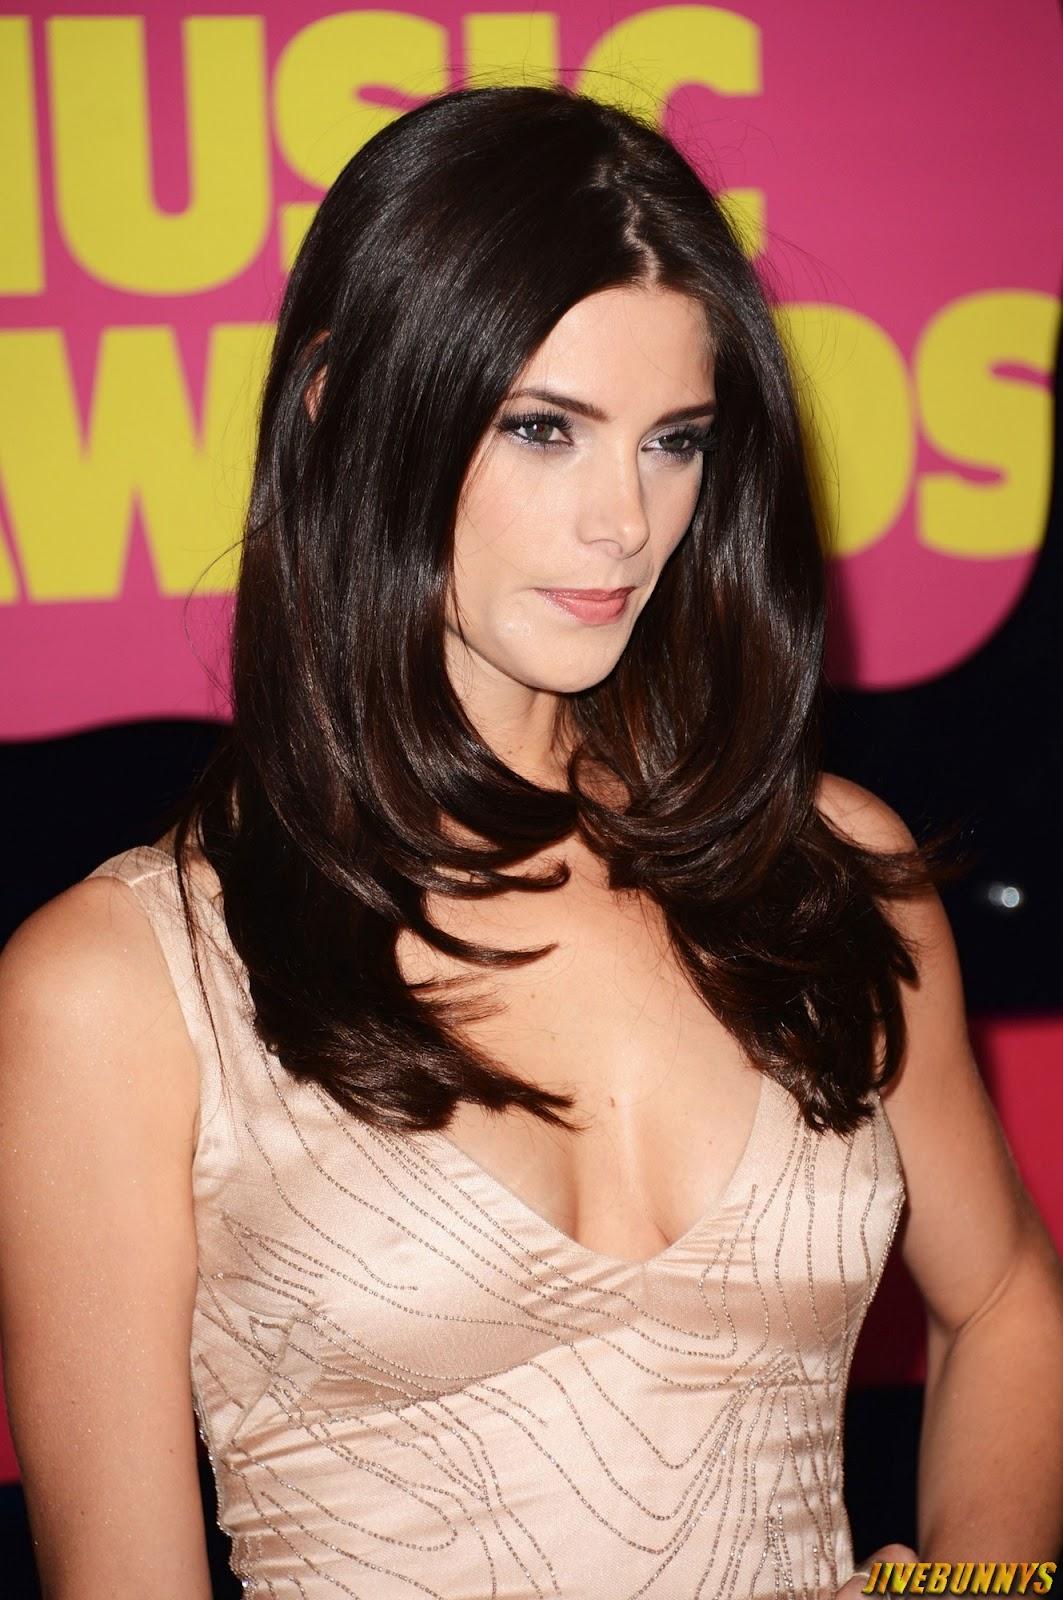 jivebunnys female celebrity picture gallery ashley greene